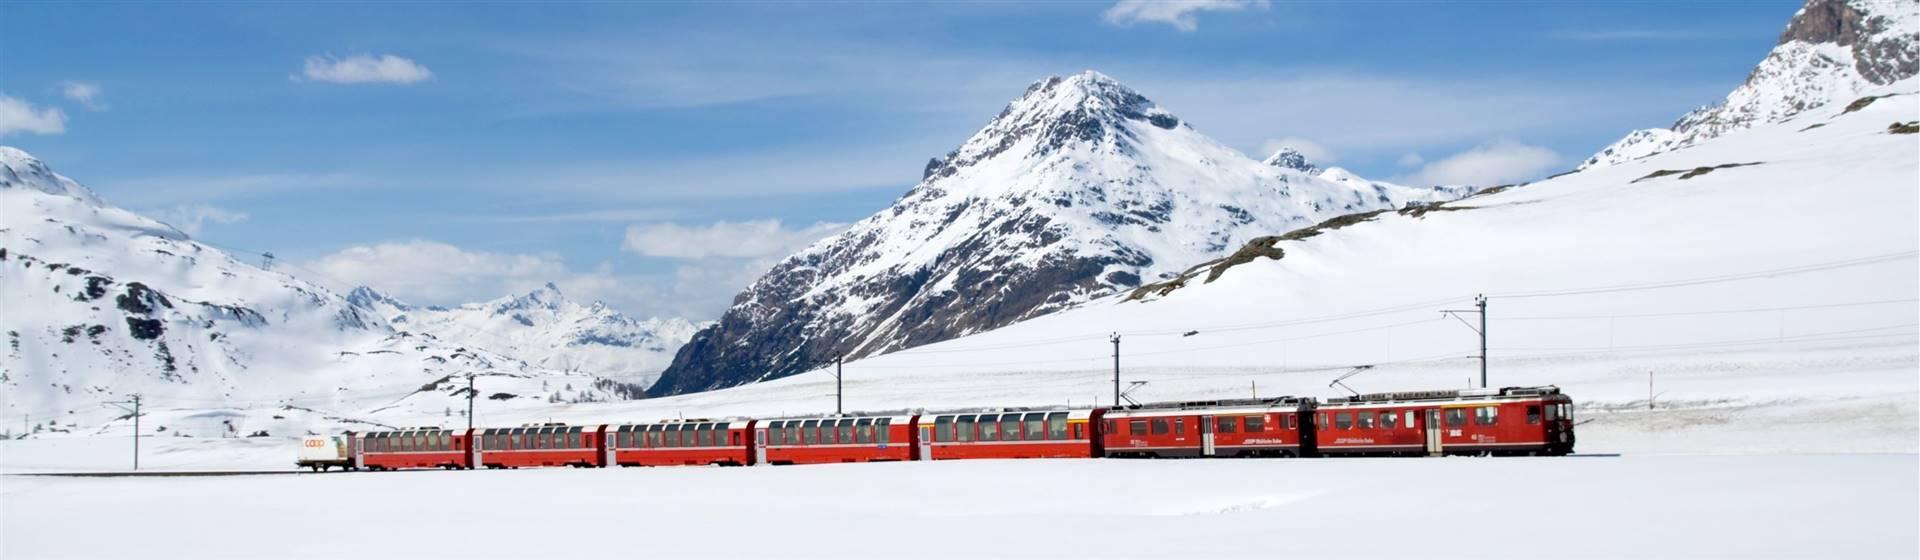 "<img src=""glacierexpress2-shutterstocklr.jpeg"" alt=""Glacier Express - Switzerland""/>"